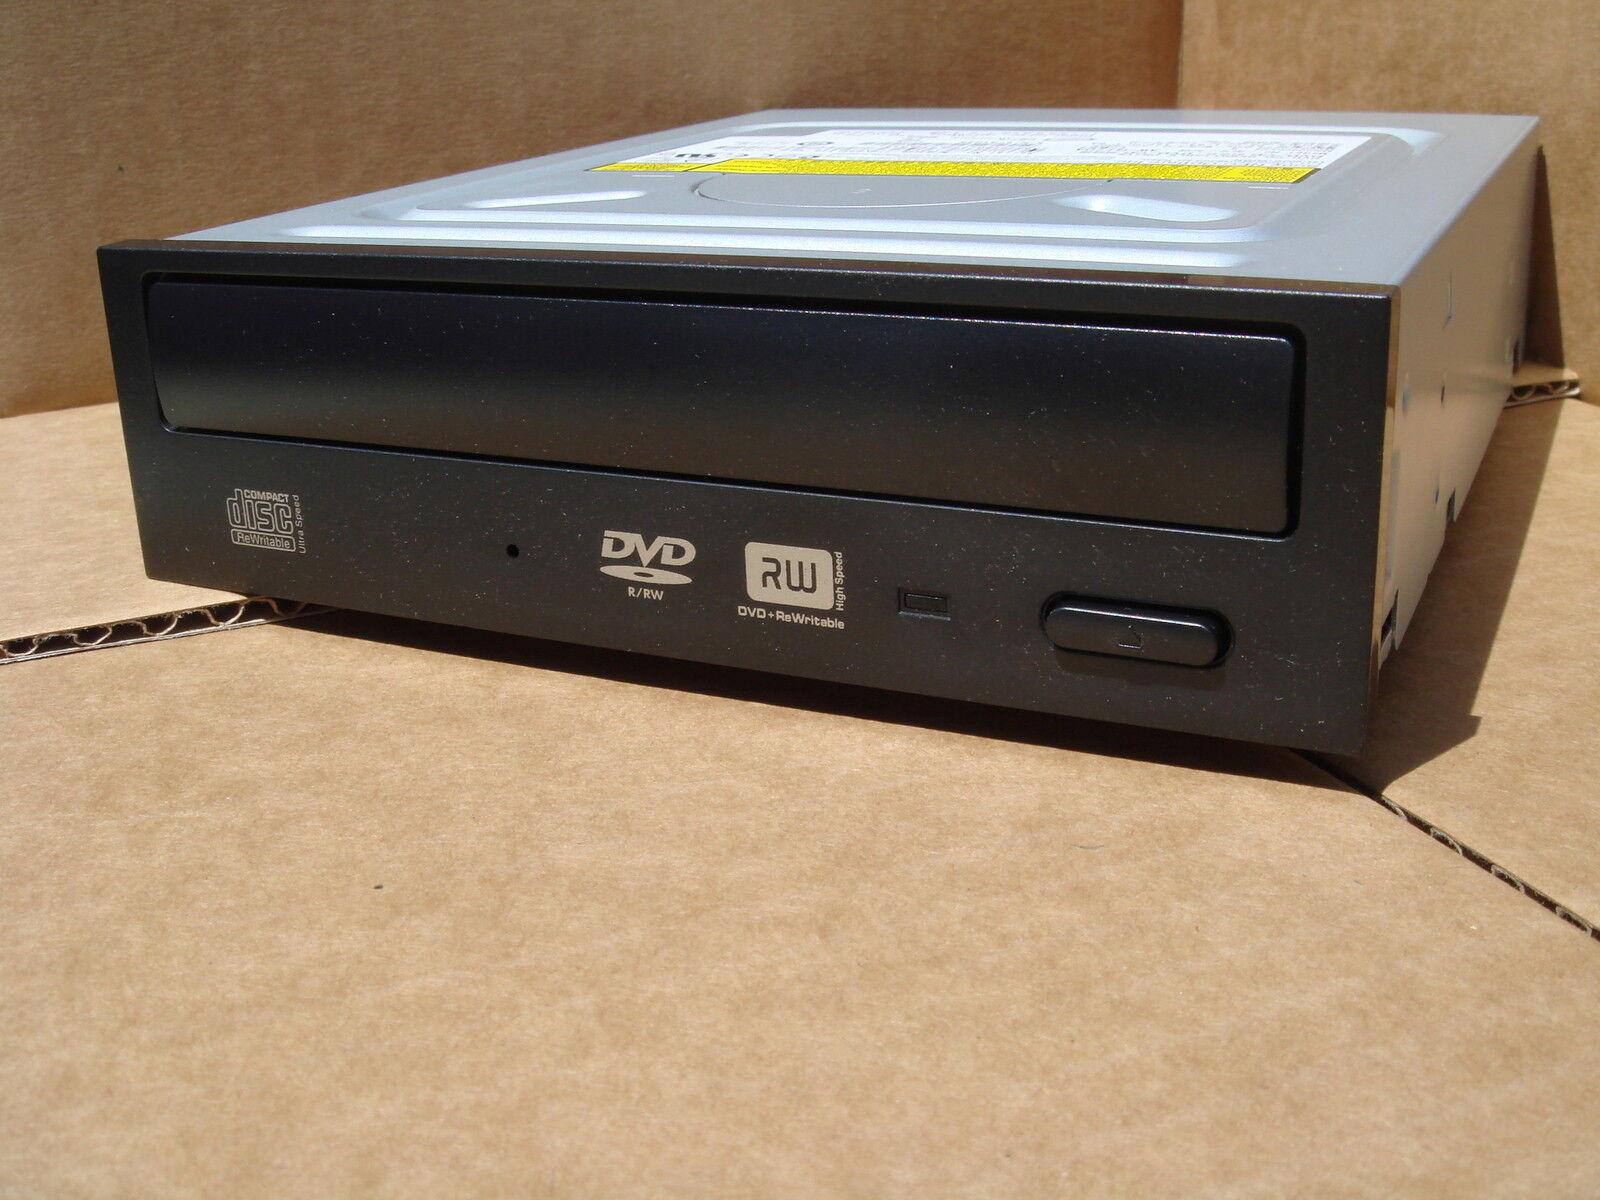 Q170A AW DRIVER RW BAIXAR DVD SONY